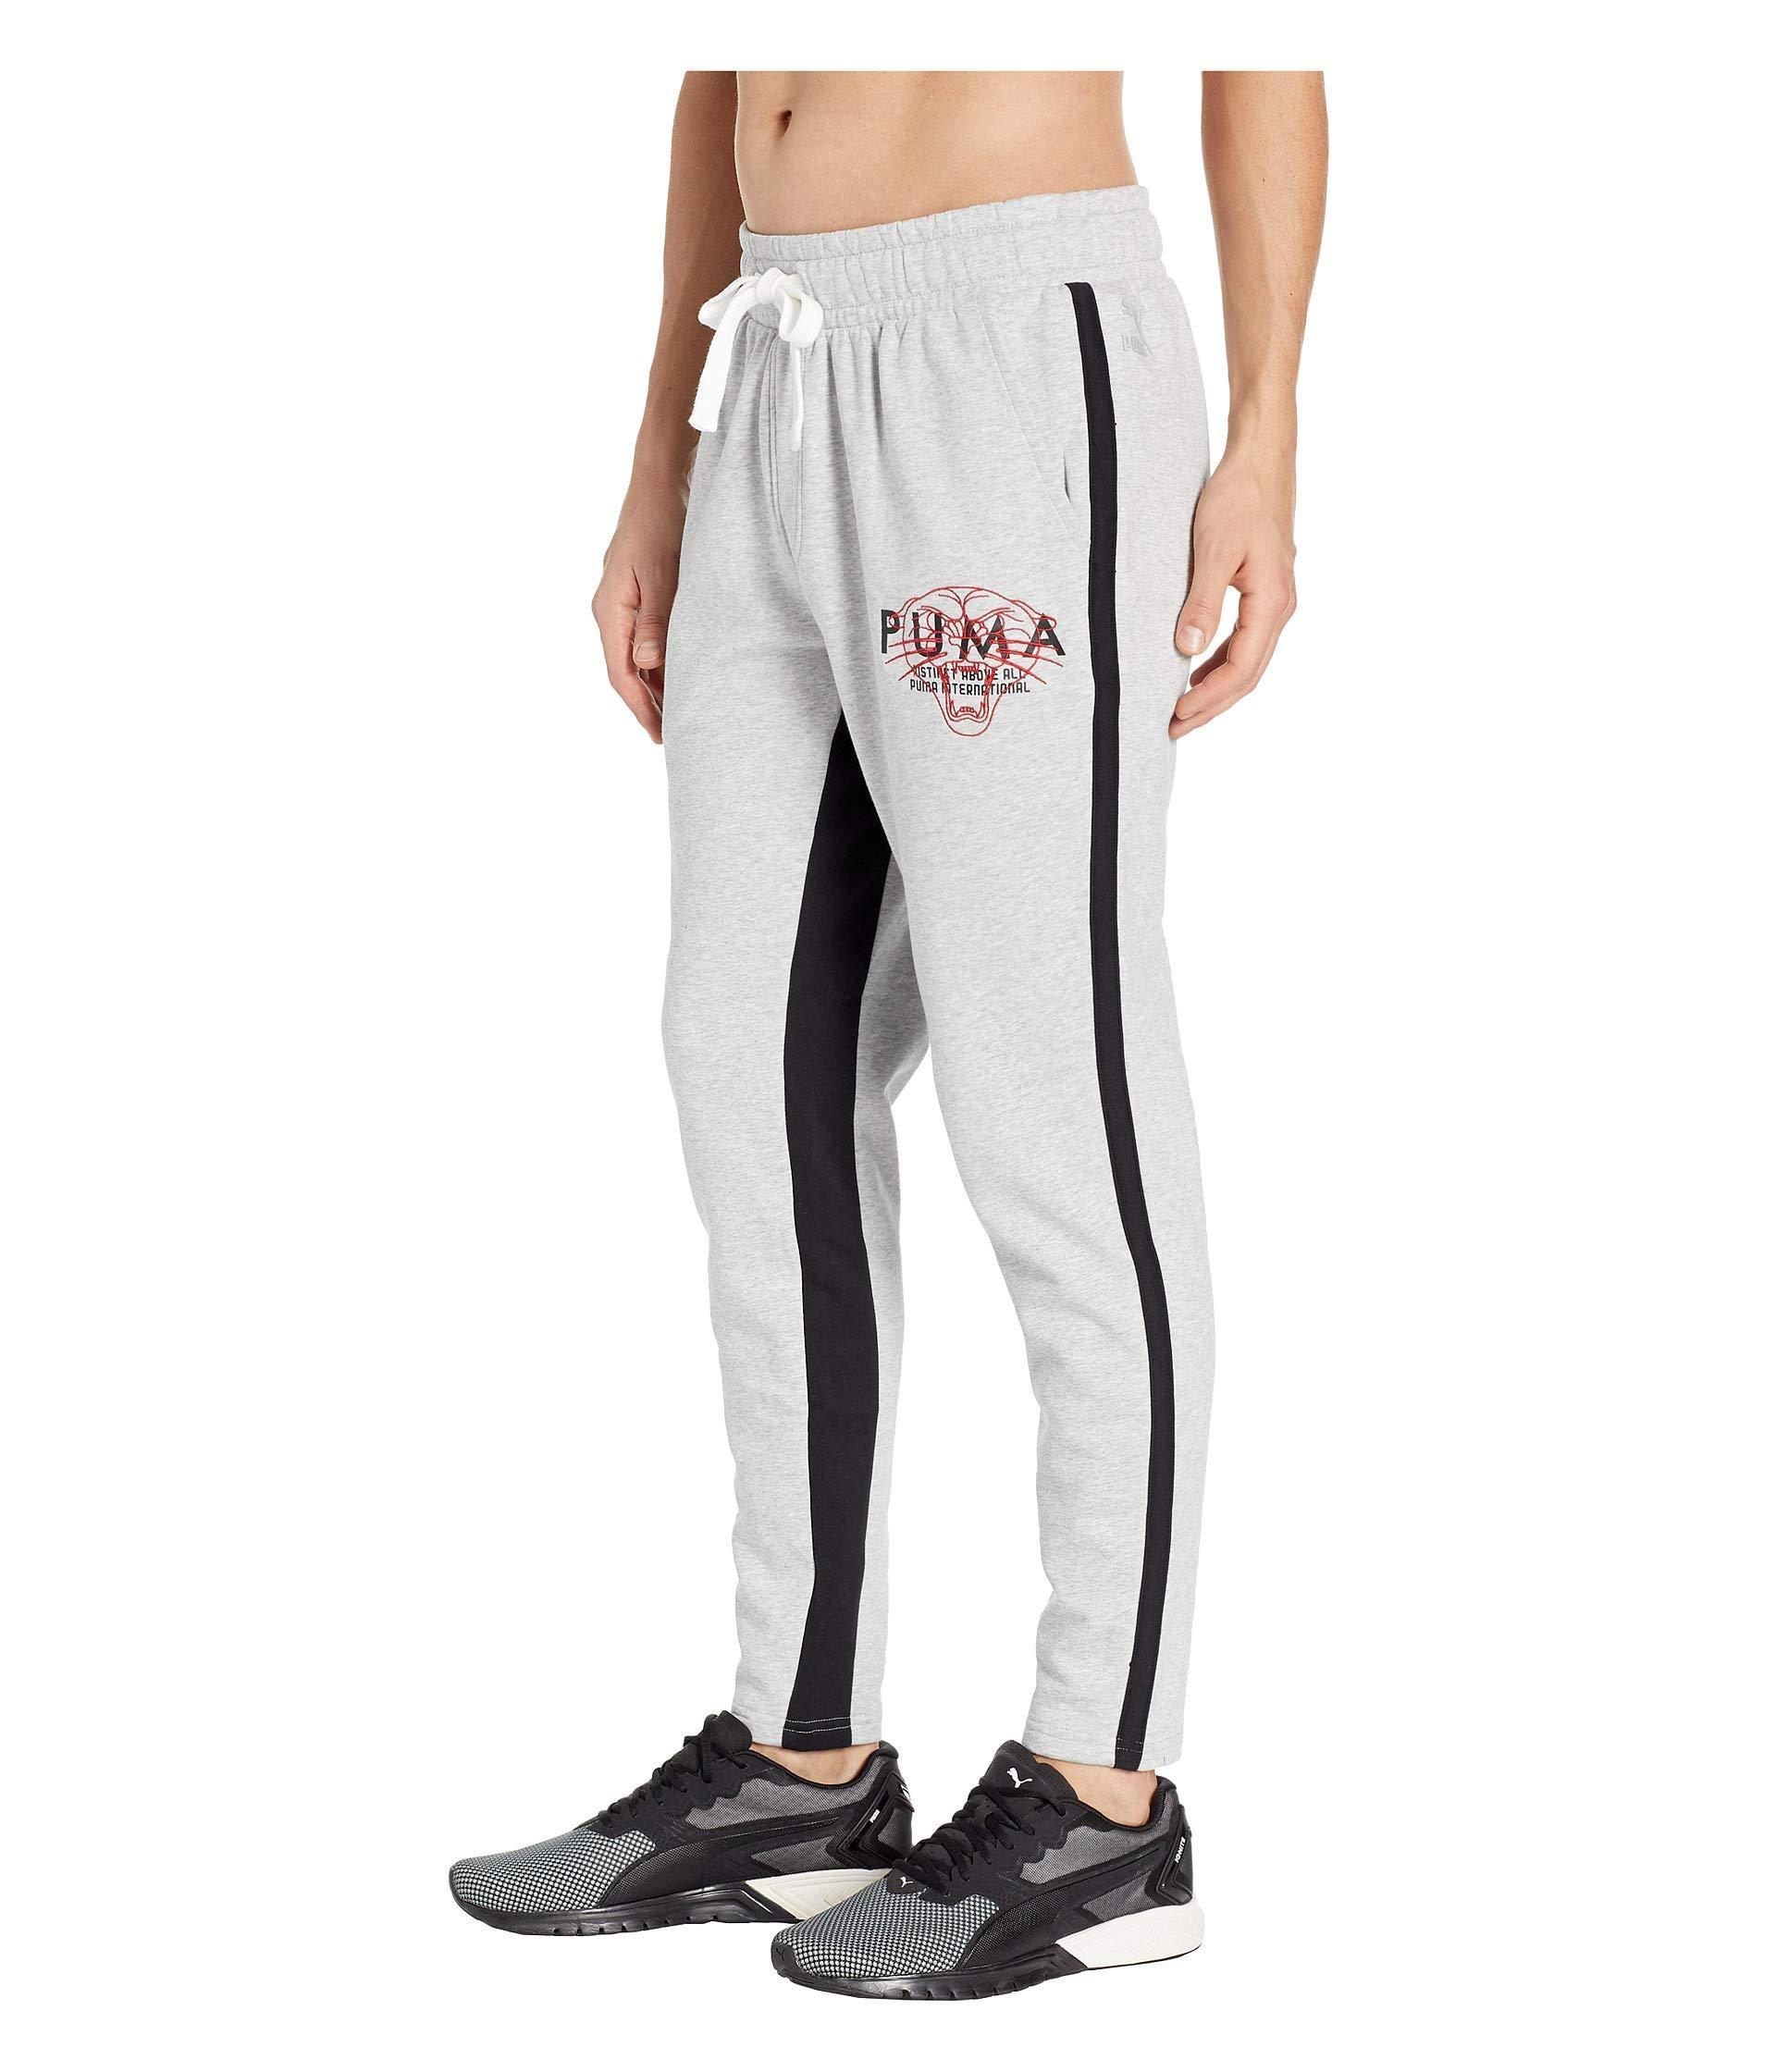 638a74e6f9ec Lyst - PUMA Last Dayz Sweatpants (light Gray Heather  Black) Men s Casual  Pants in Gray for Men